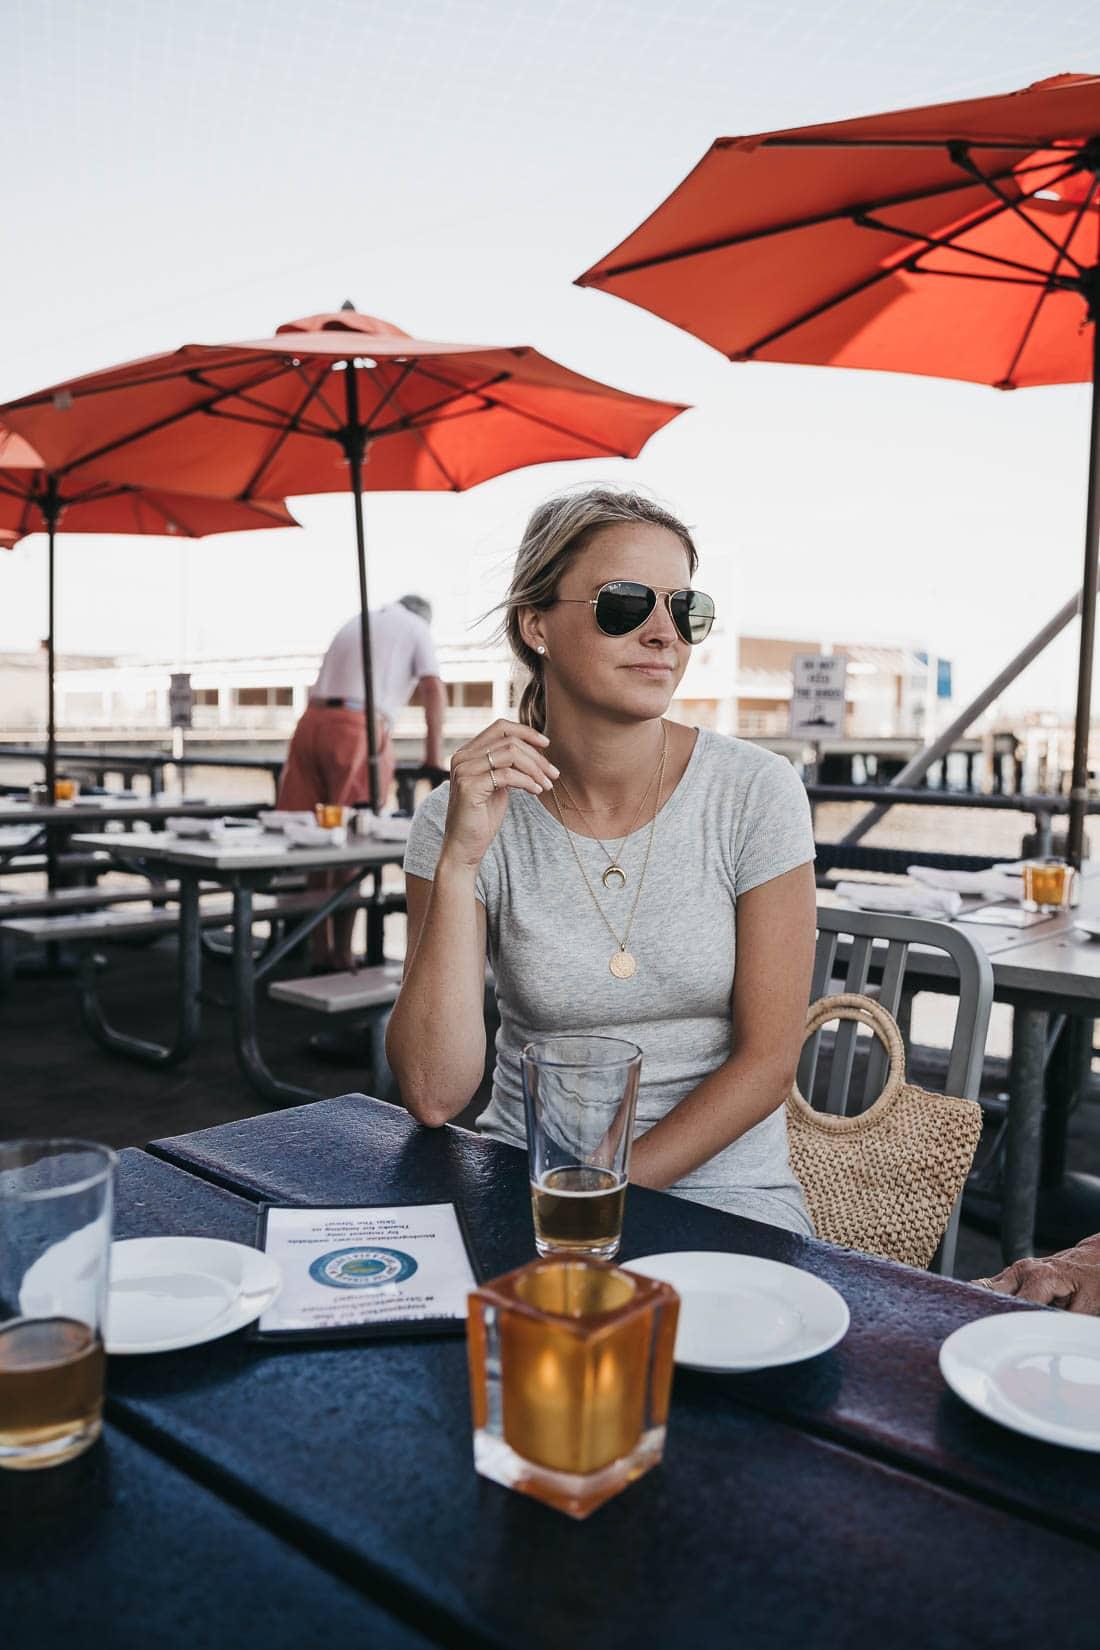 Outdoor restaurants in Charleston